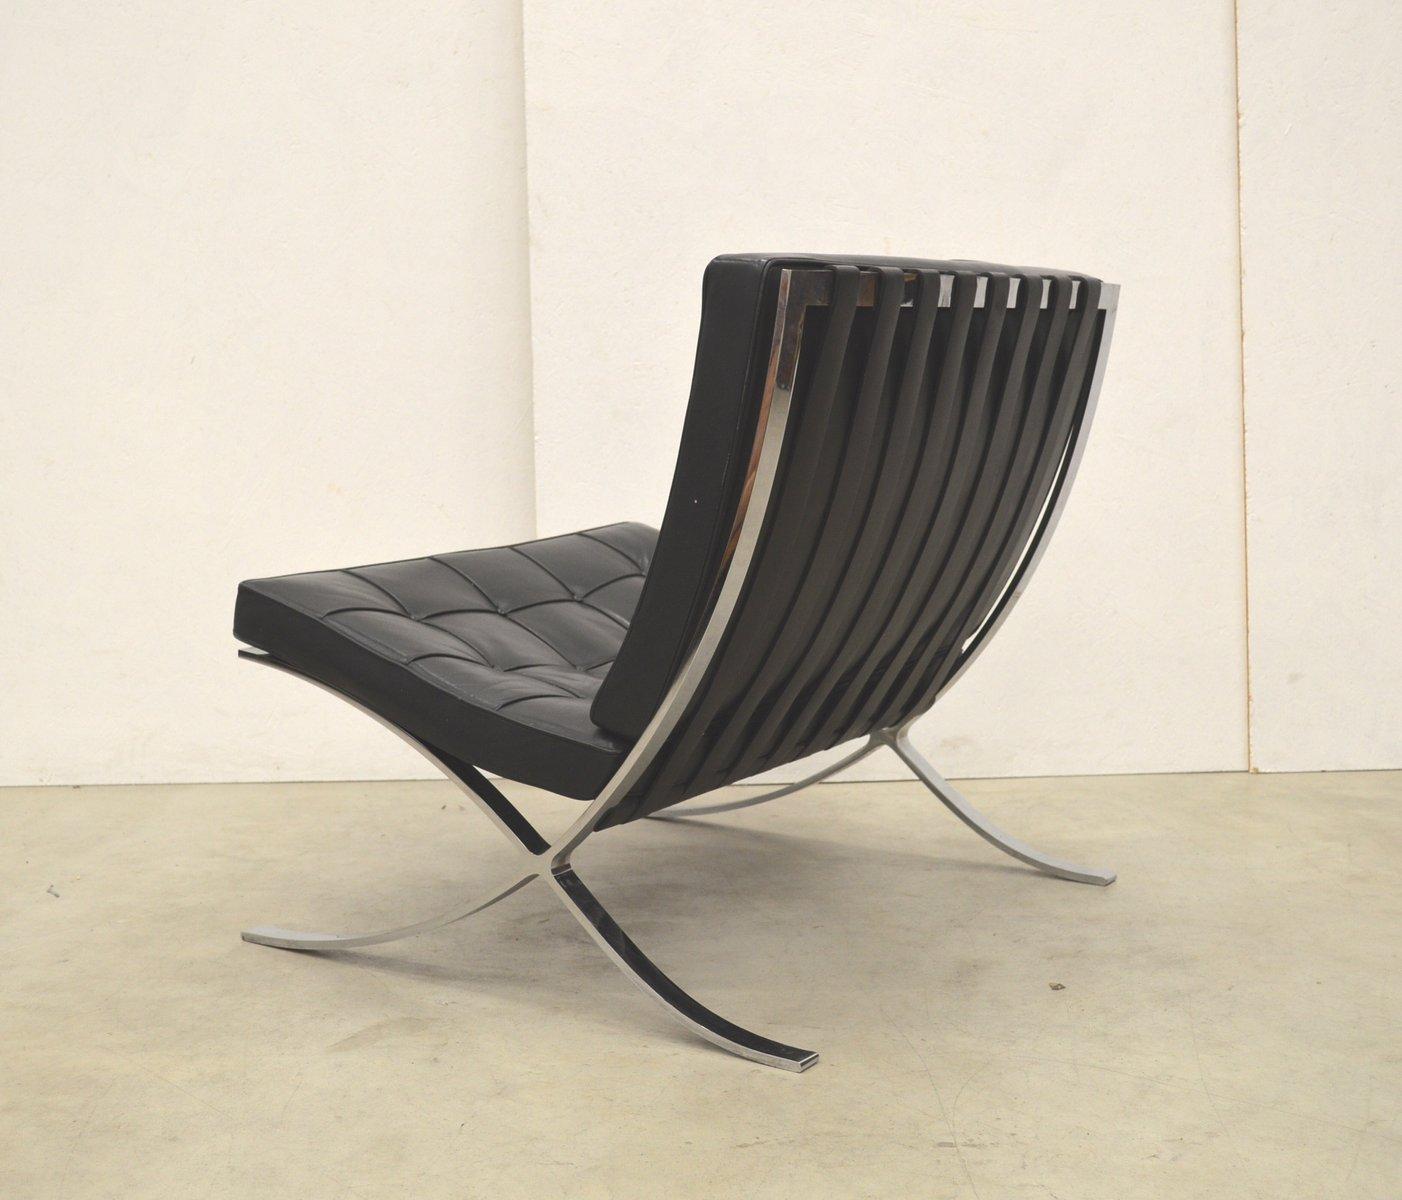 vintage barcelona stuhl von mies van der rohe f r knoll. Black Bedroom Furniture Sets. Home Design Ideas